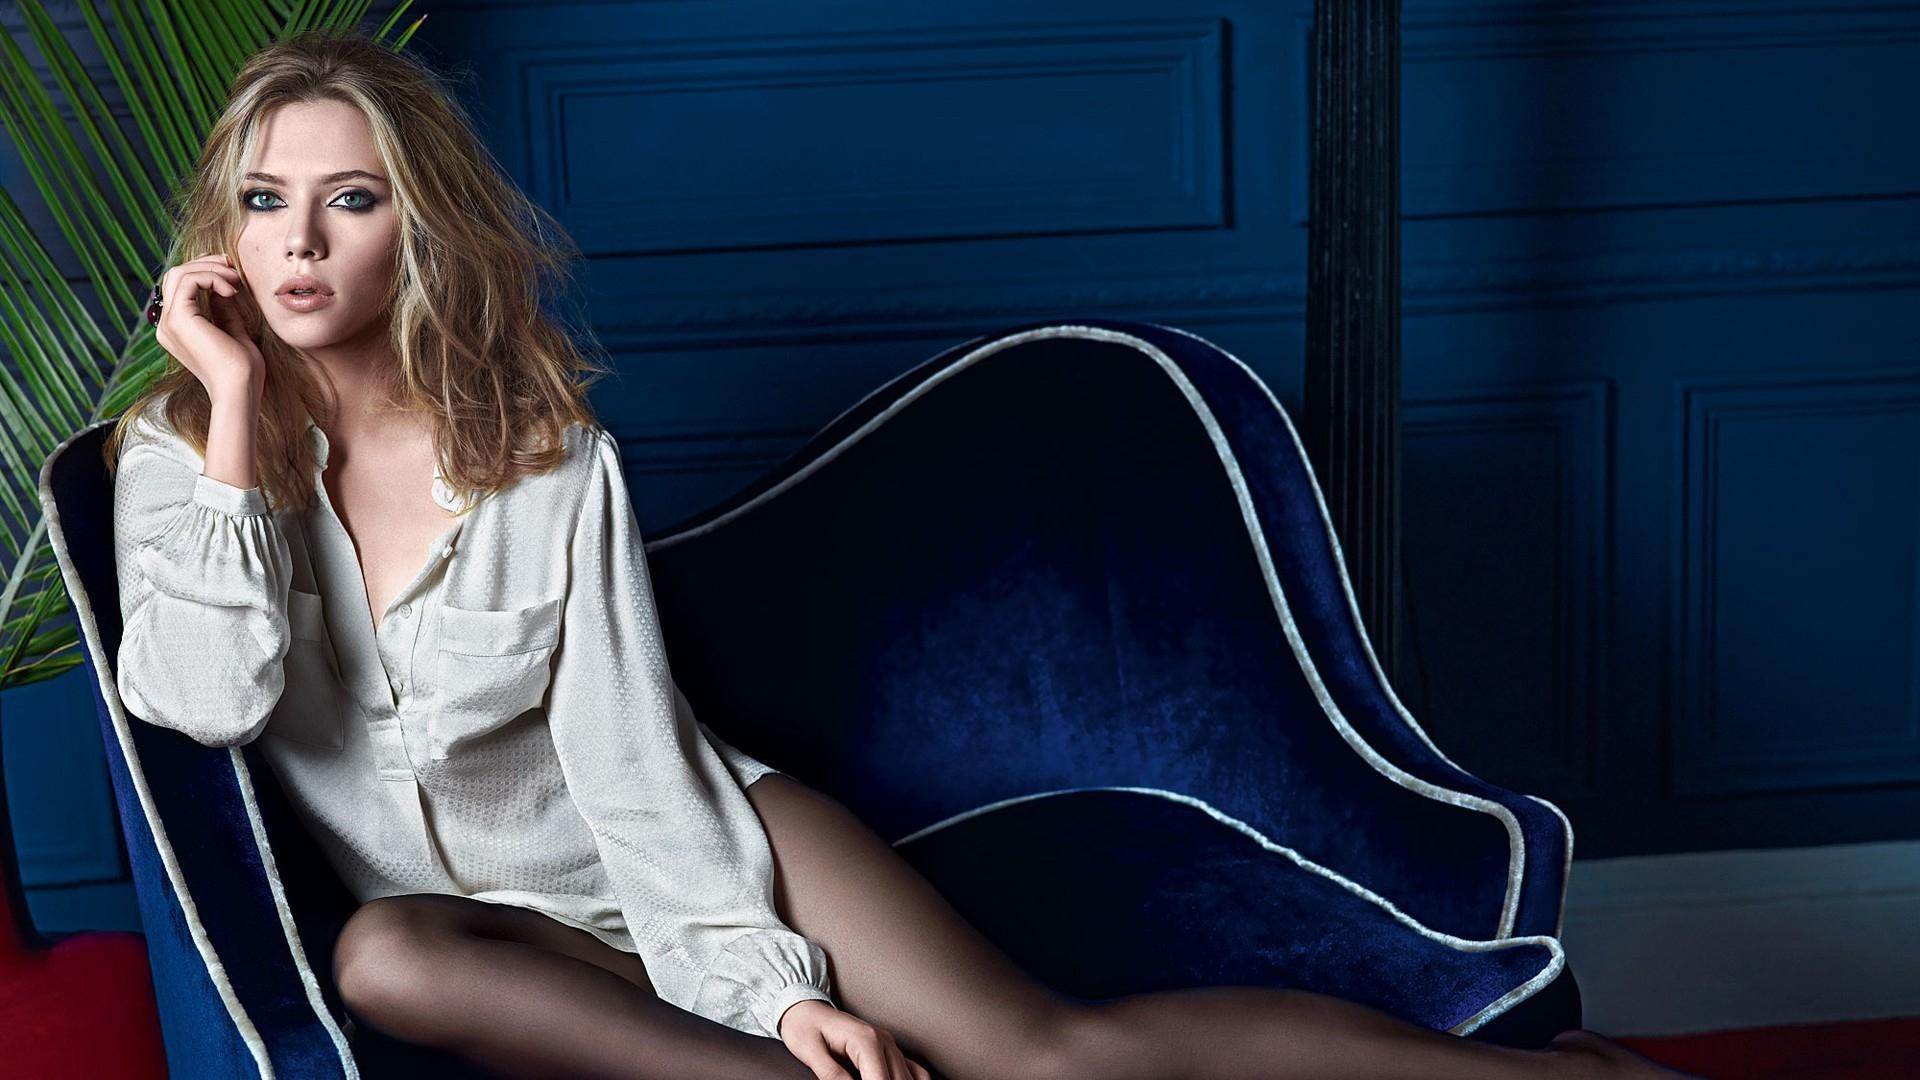 Nice Scarlett Johansson 1920x1080 | Magicwallpapers.net ... Scarlett Johansson